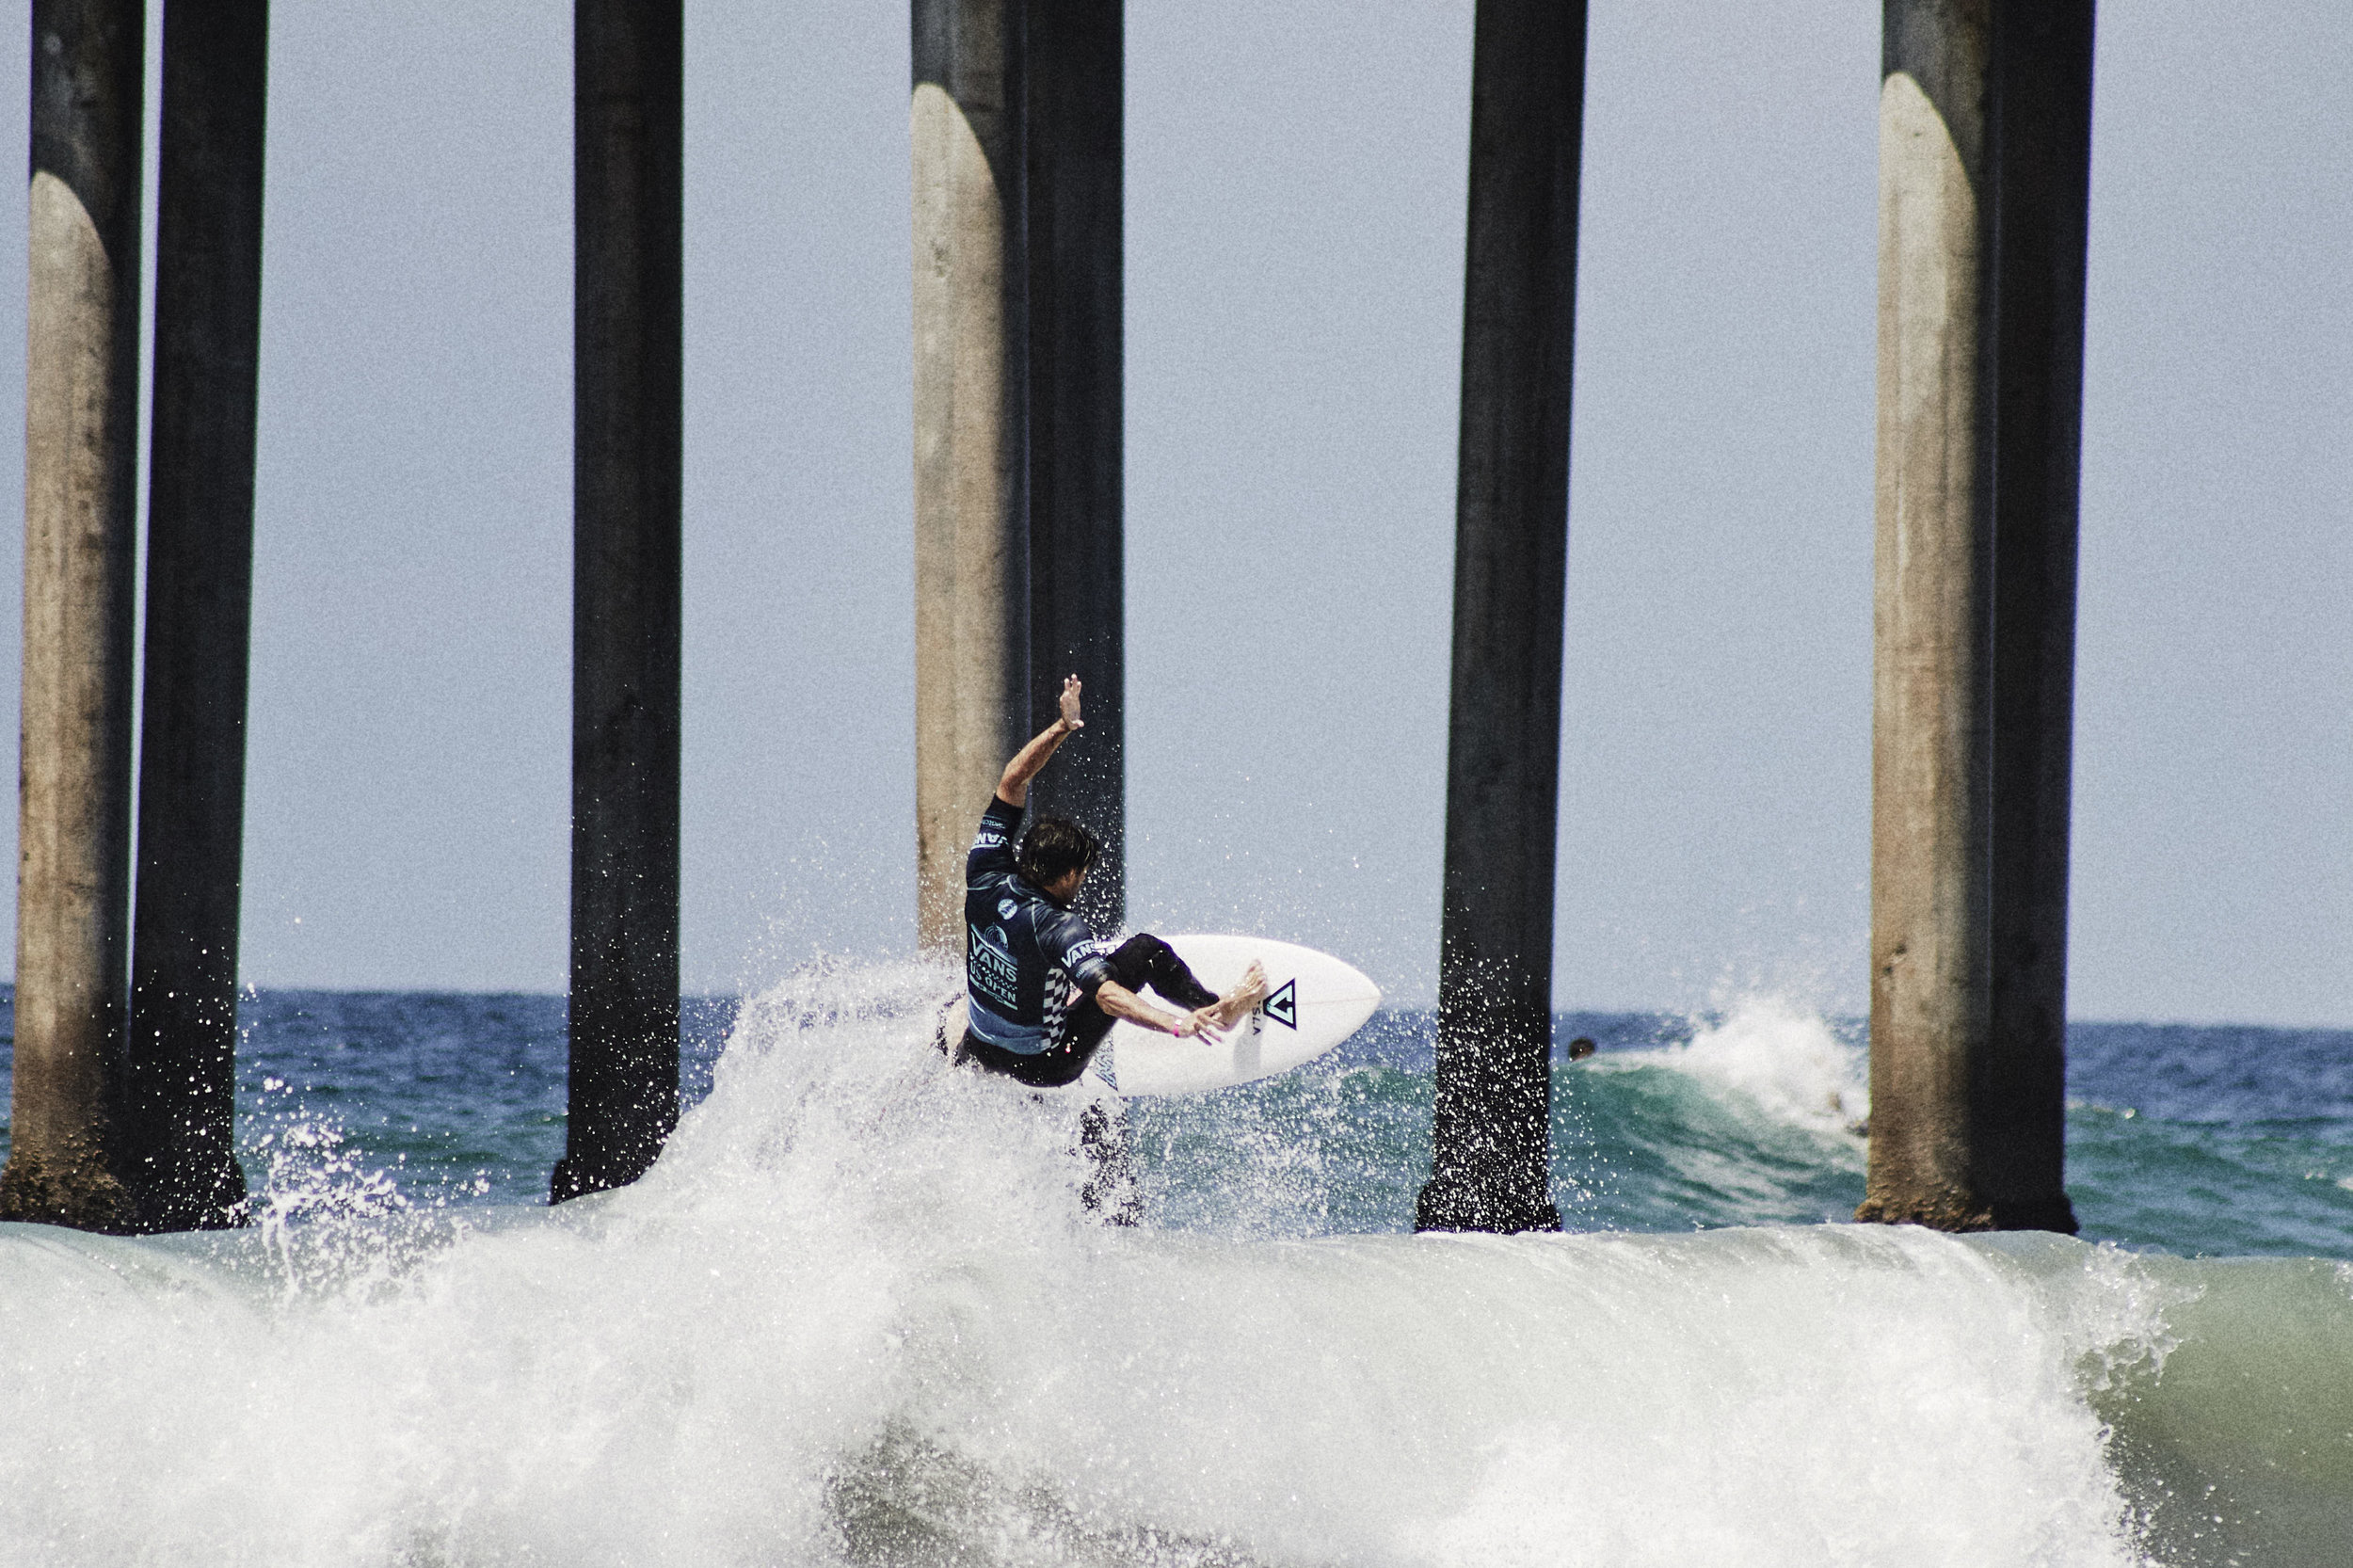 Huntington_Vans_US_Surf_Open_248.jpg